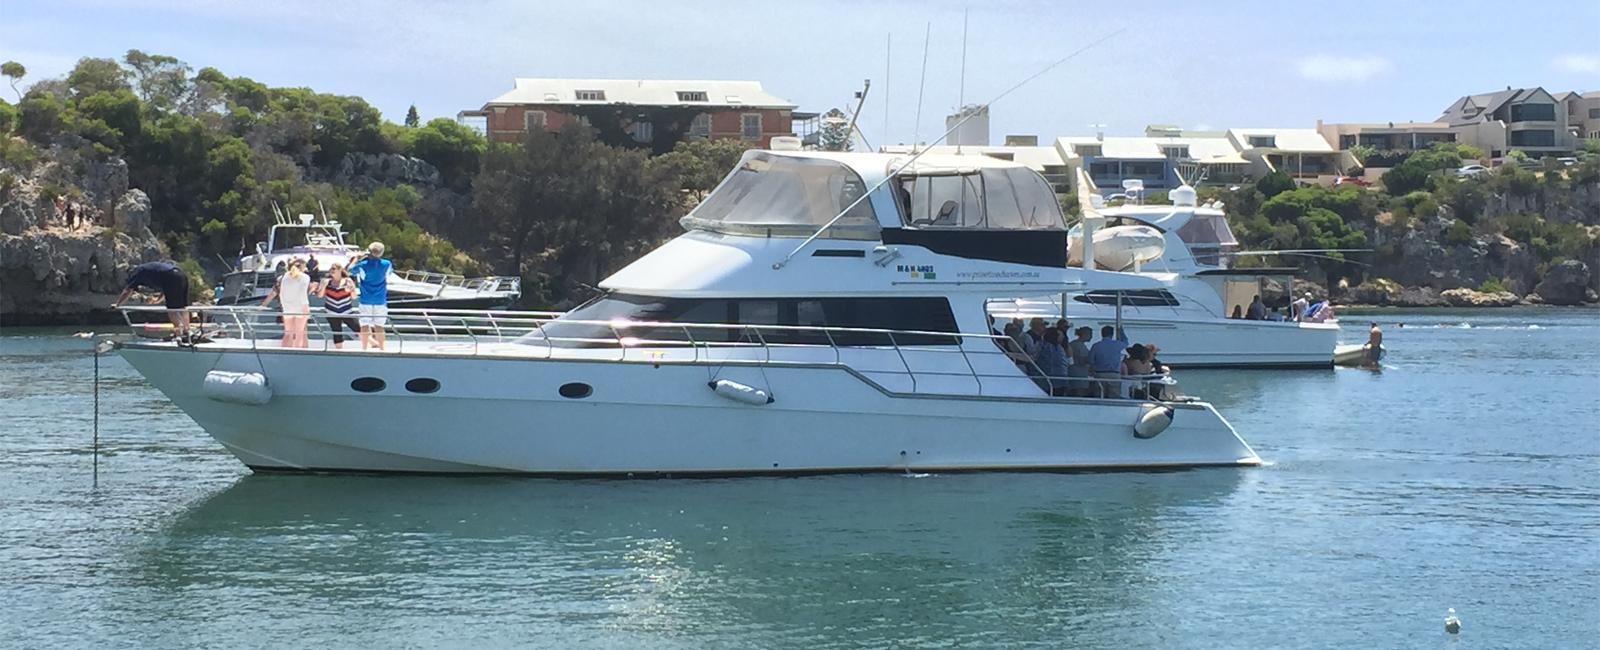 ALEGRIA-boat-charters-perth-wa-boat-hire-swan-river-rottnest